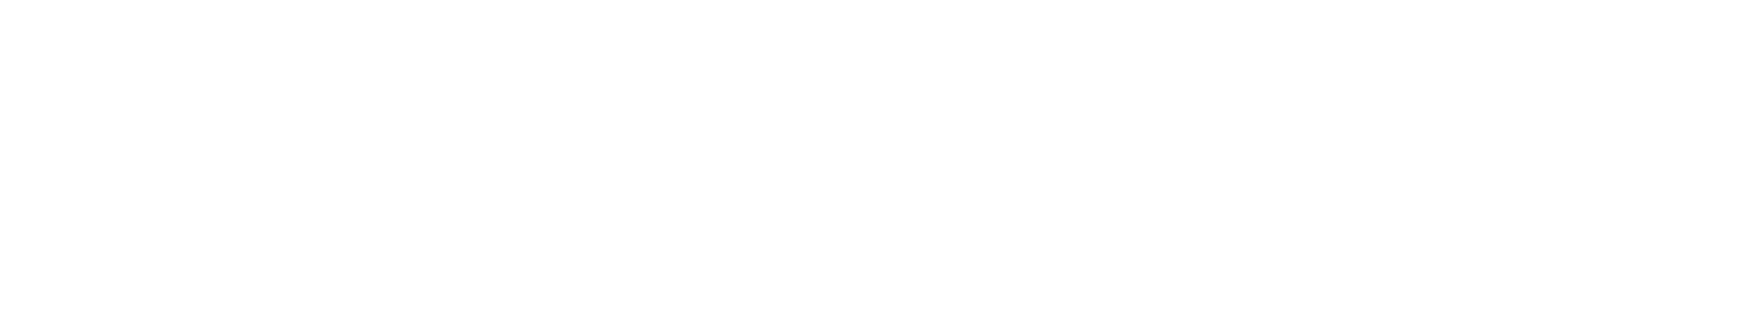 komatsu_logo.png